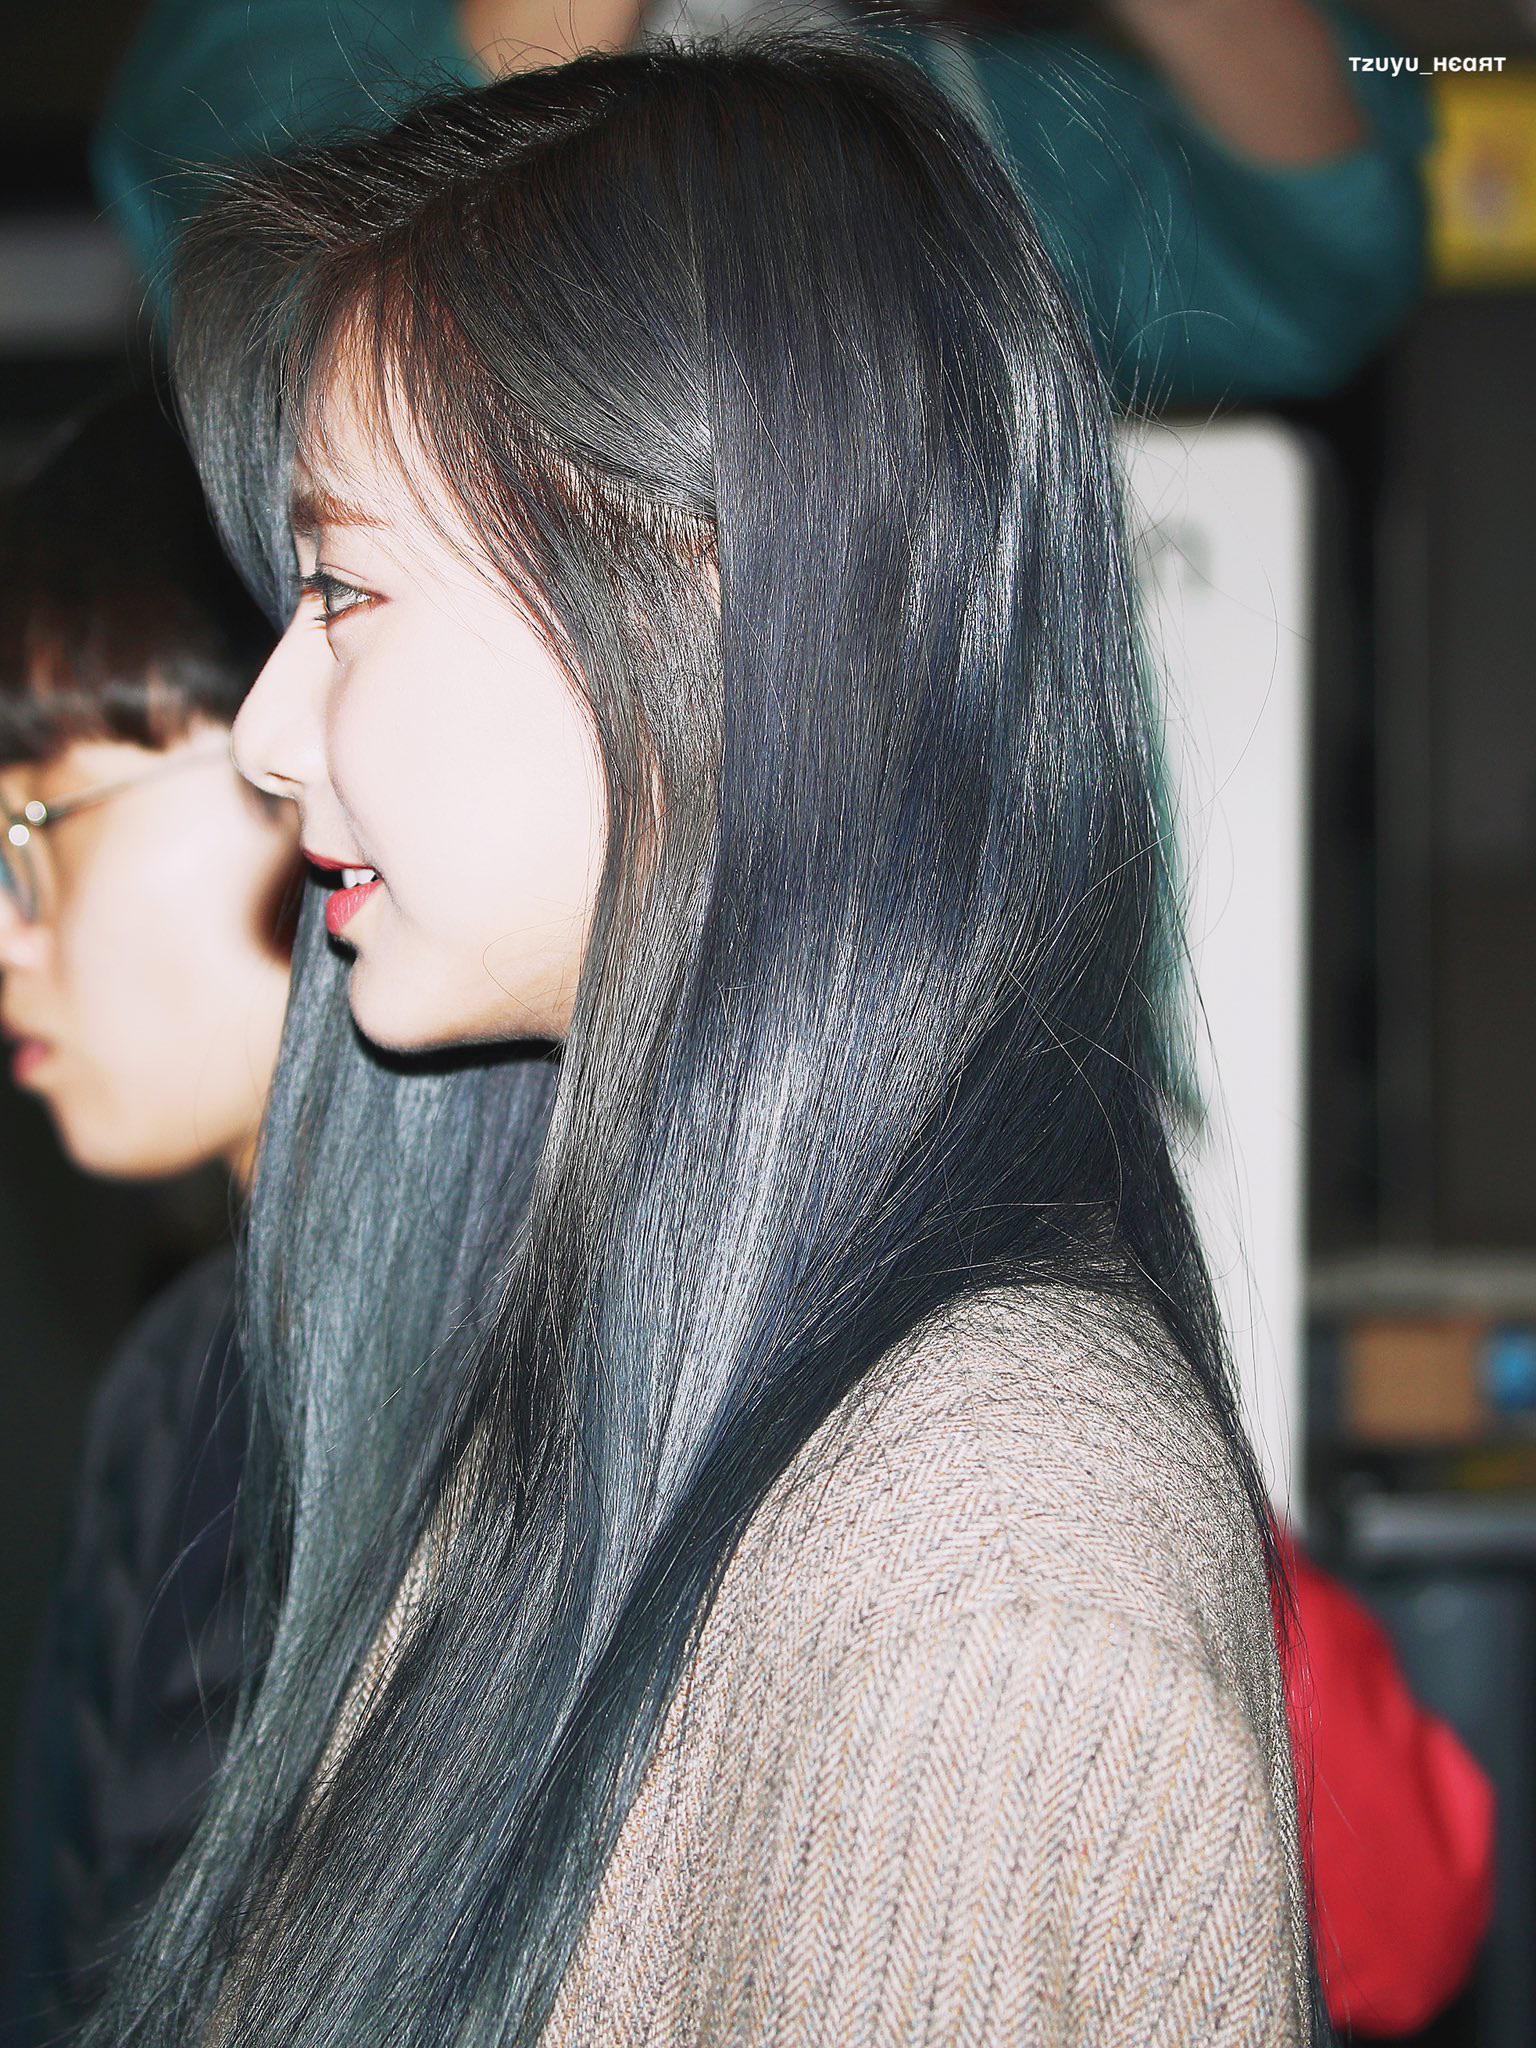 tzuyu profile 17